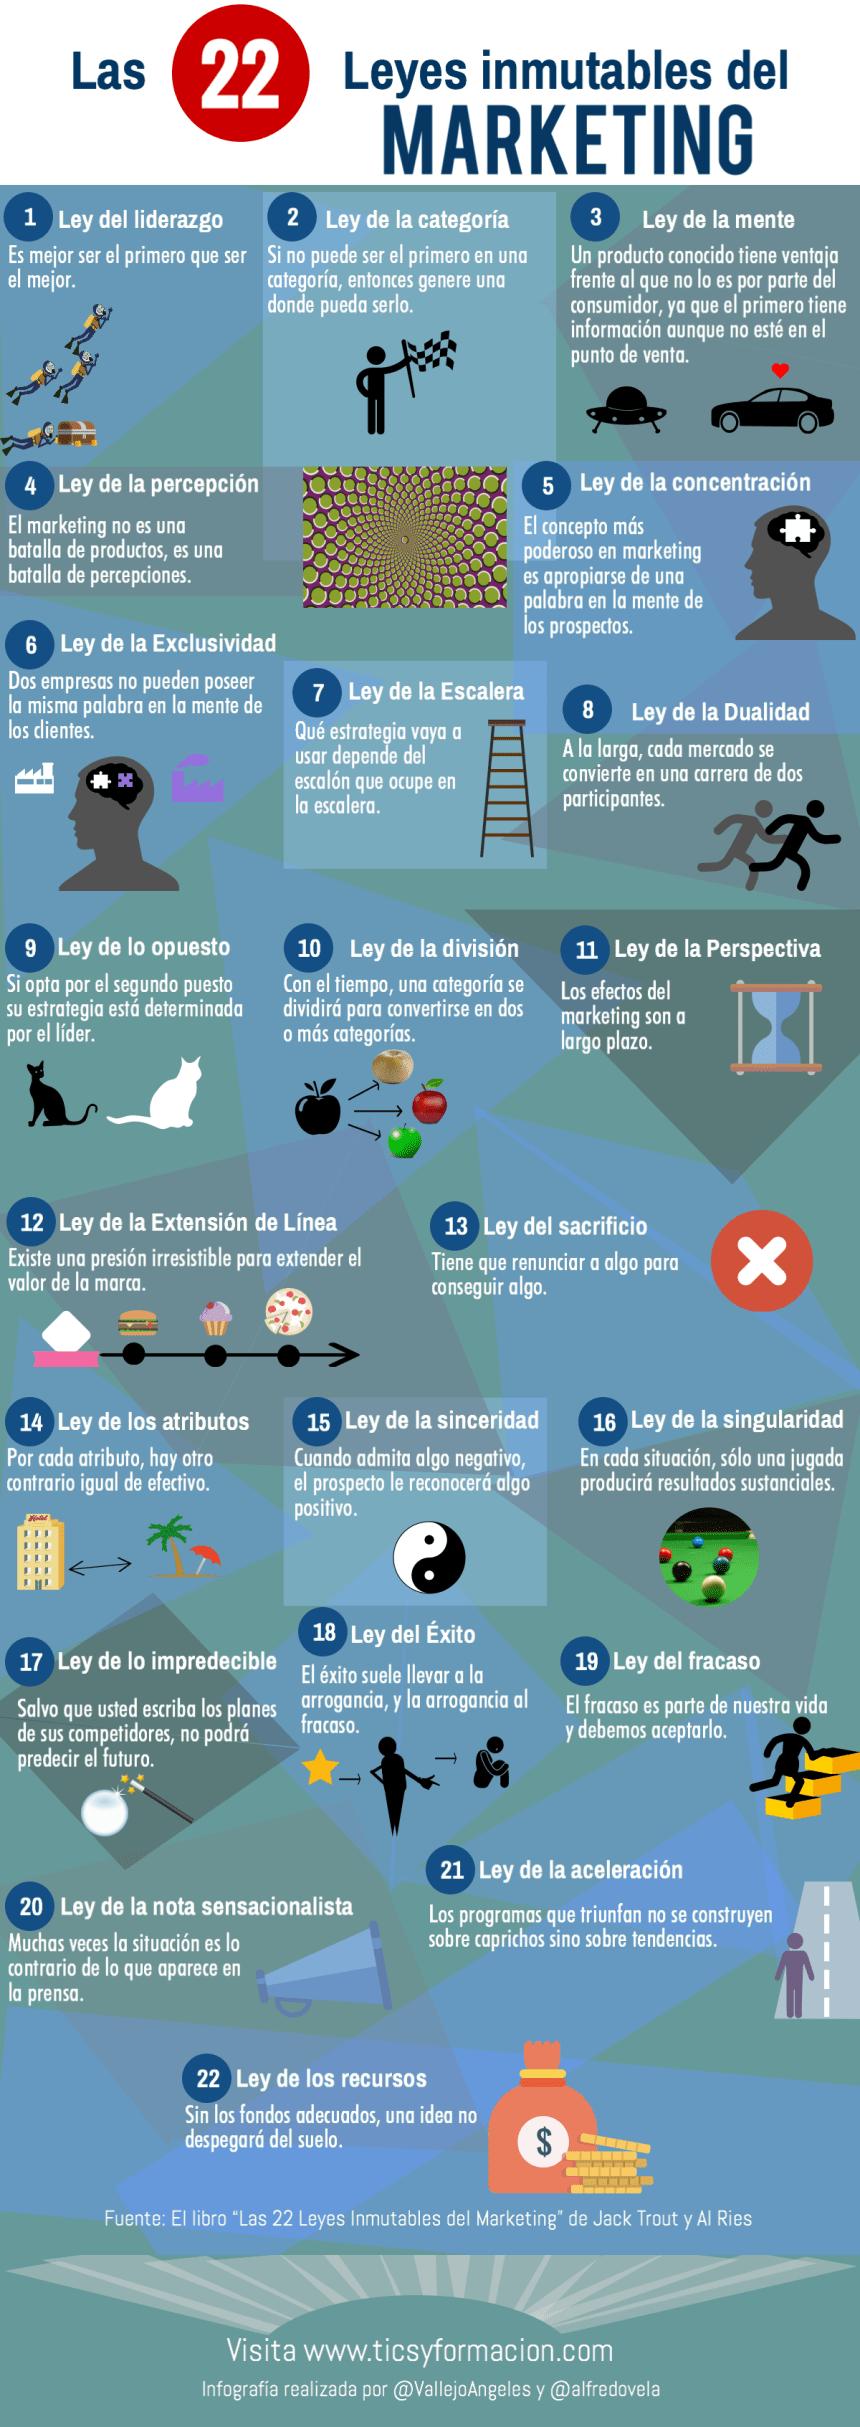 Las 22 Leyes inmutables del Marketing #infografia #infographic #marketing